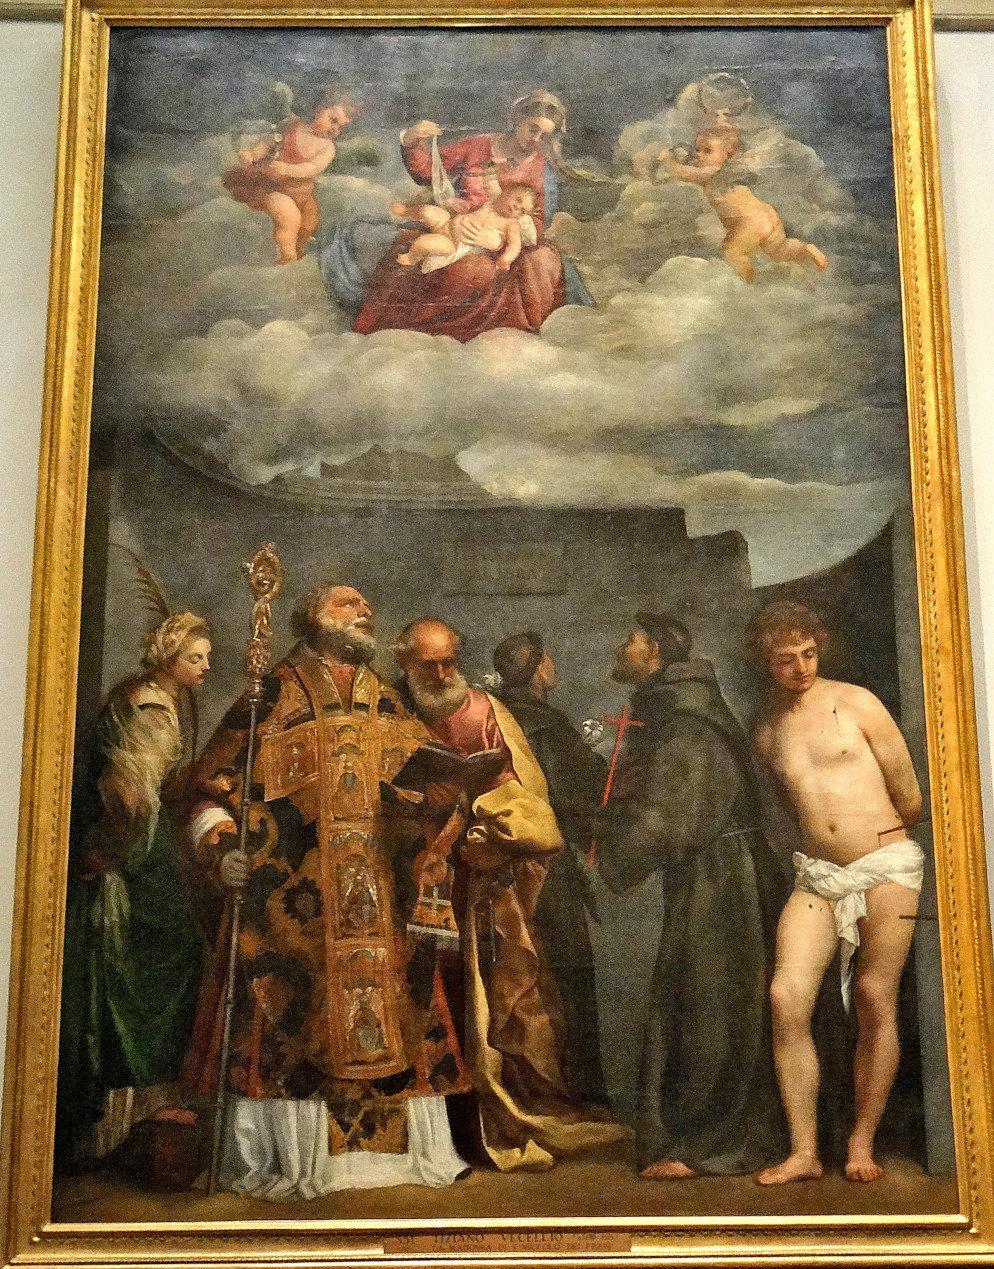 Titian (c1490-1576) - La Madonna dei Frari, 1520-25. - Vatican Art Gallery